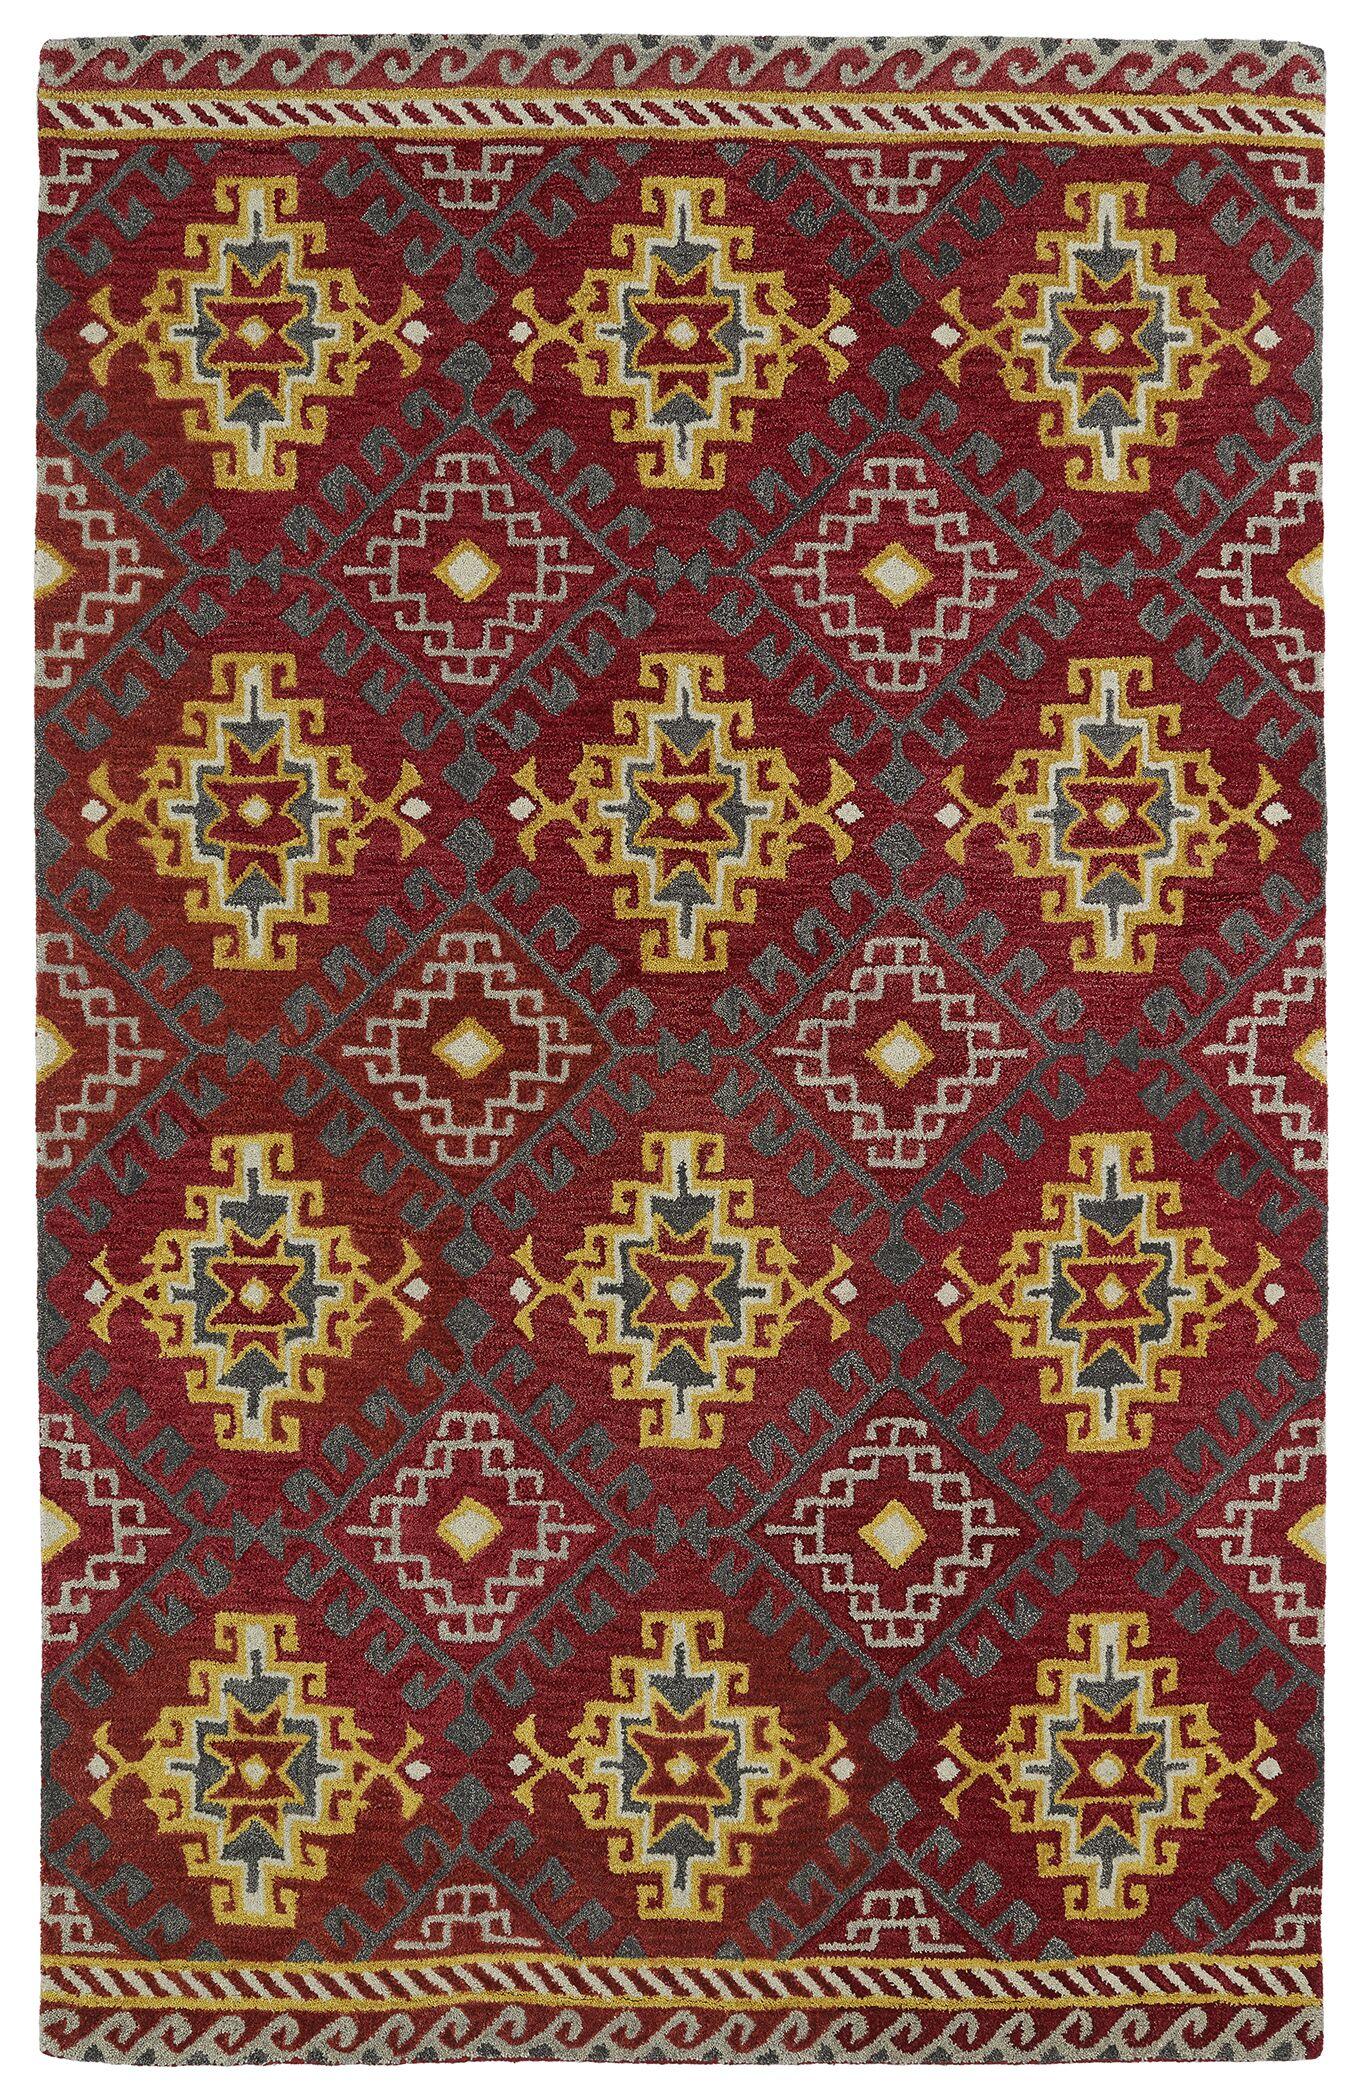 Kasa Red Area Rug Rug Size: Rectangle 5' x 7'9